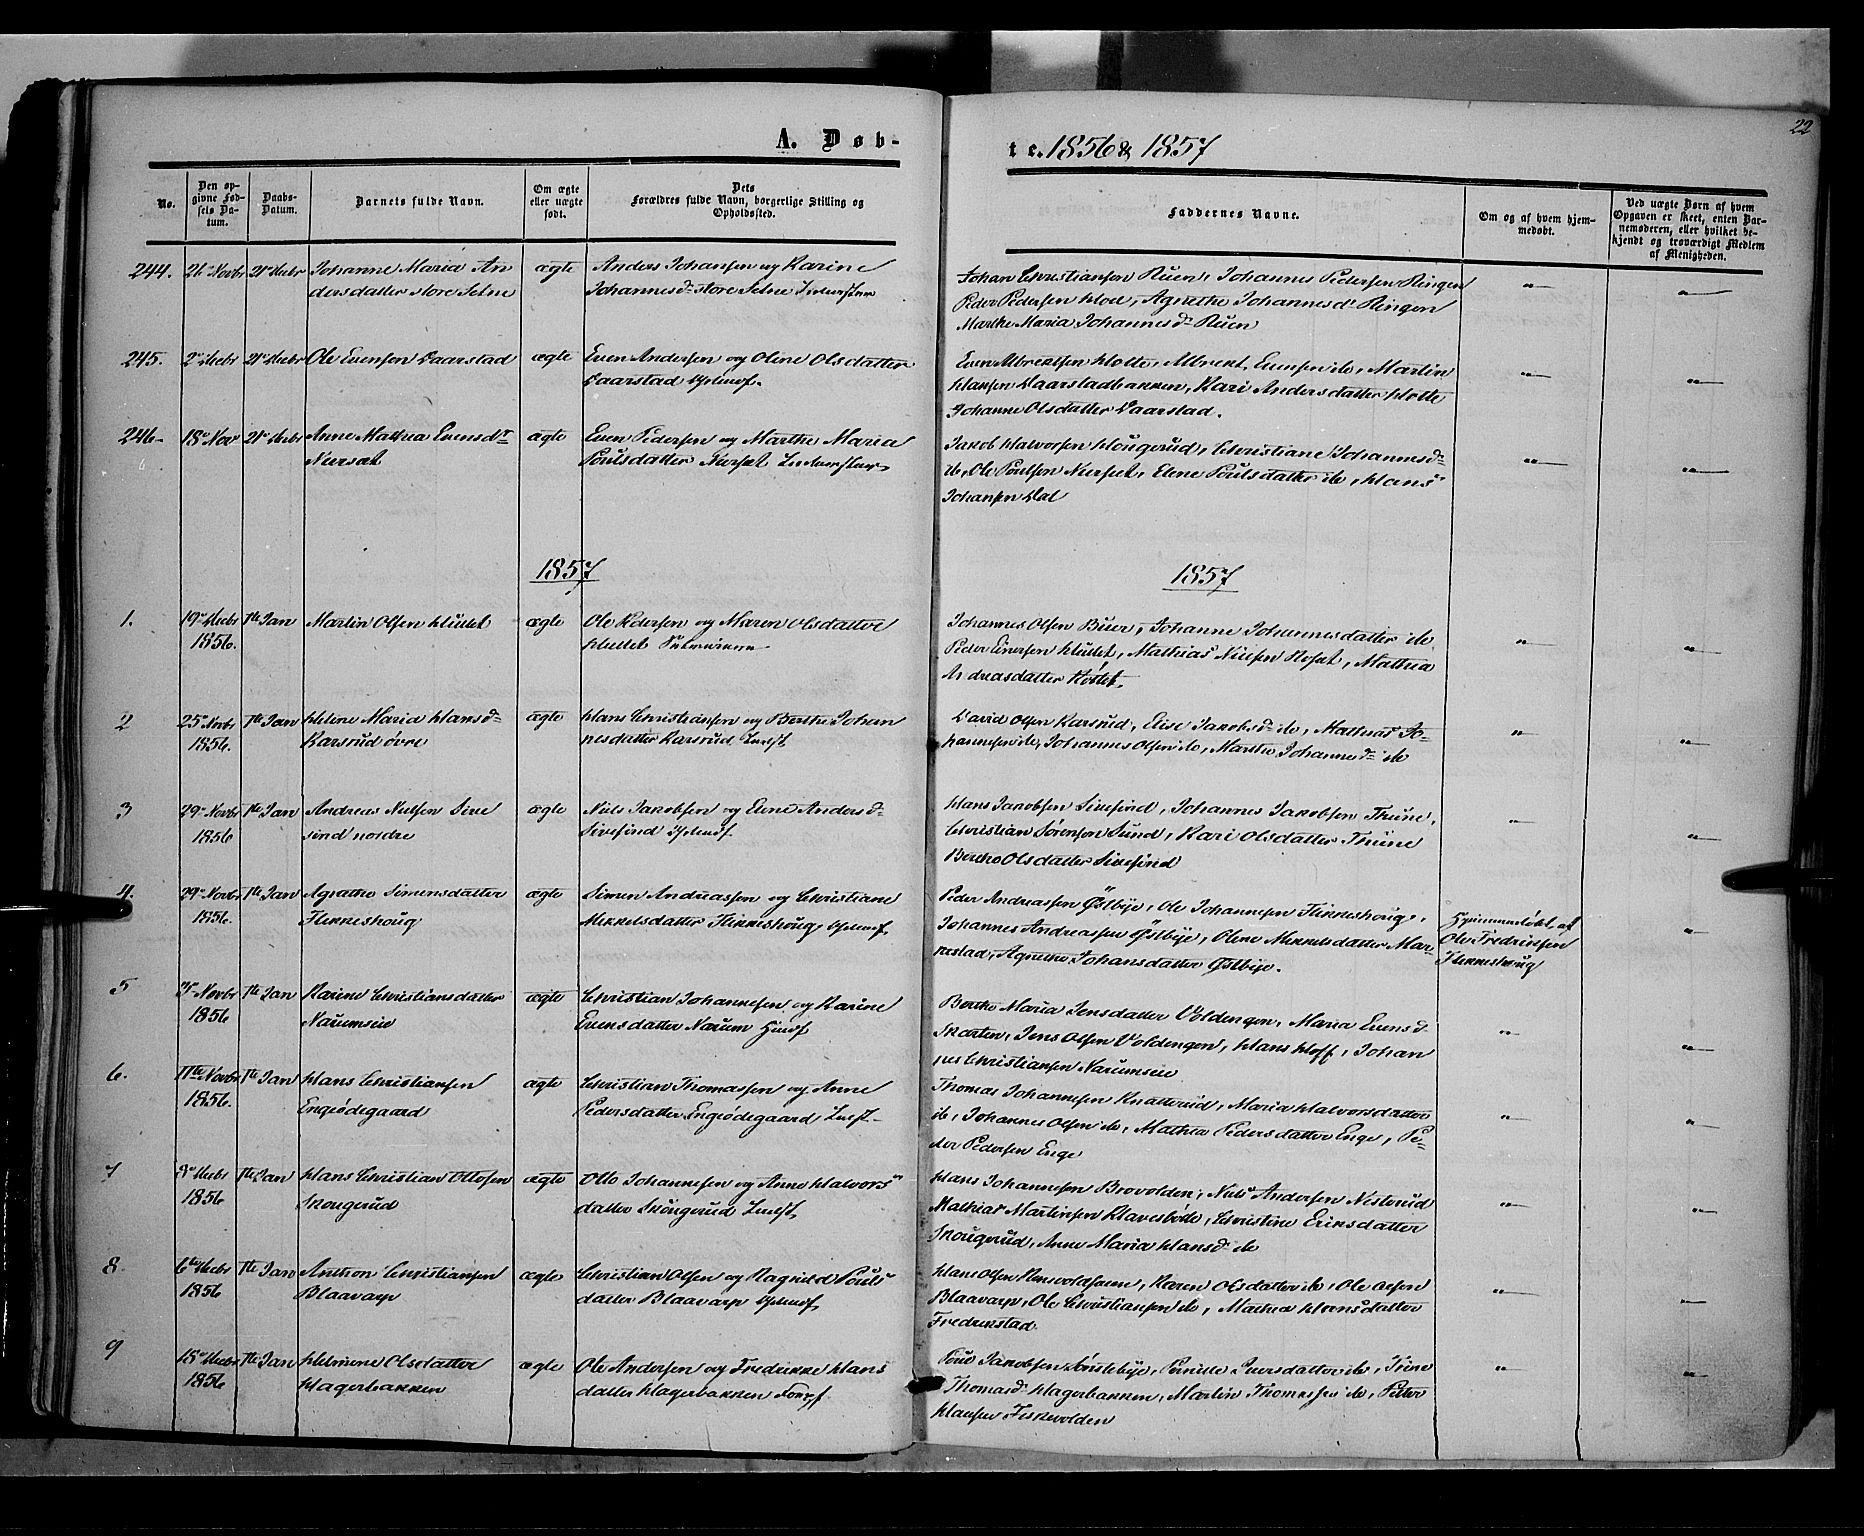 SAH, Vestre Toten prestekontor, H/Ha/Haa/L0006: Ministerialbok nr. 6, 1856-1861, s. 22